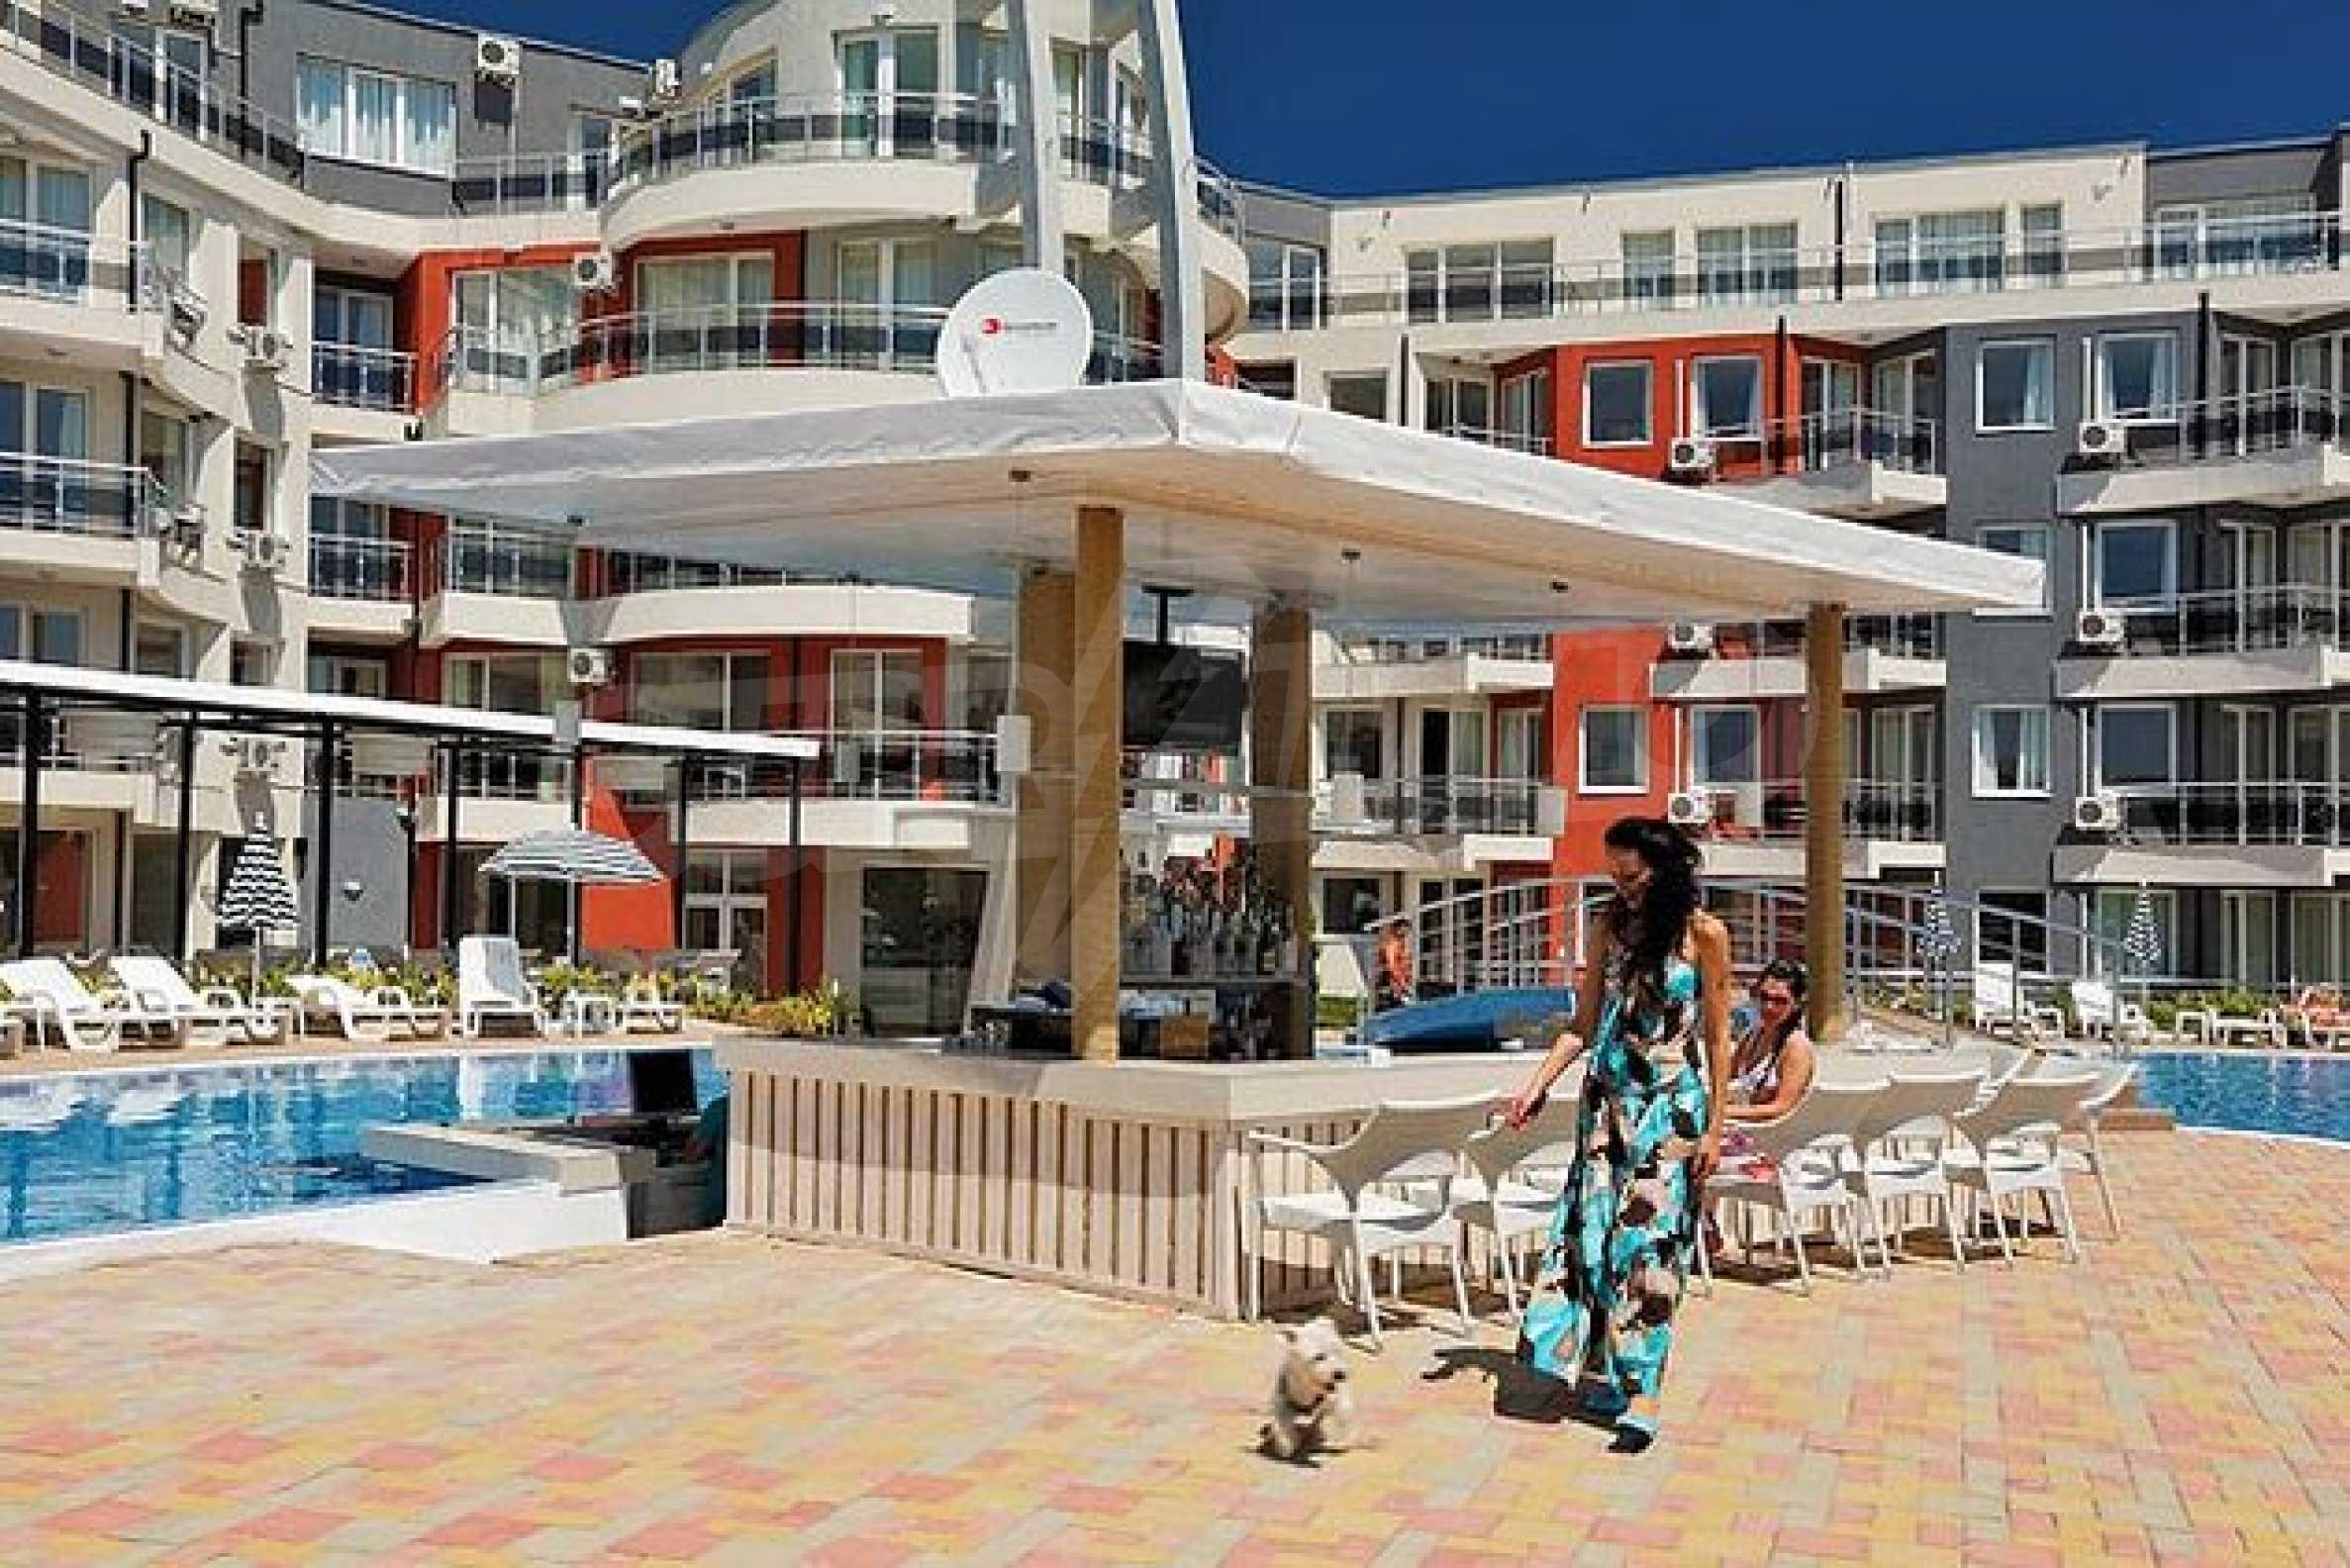 Emberli Park Bar & Diner in the beach resort of Lozenets 15